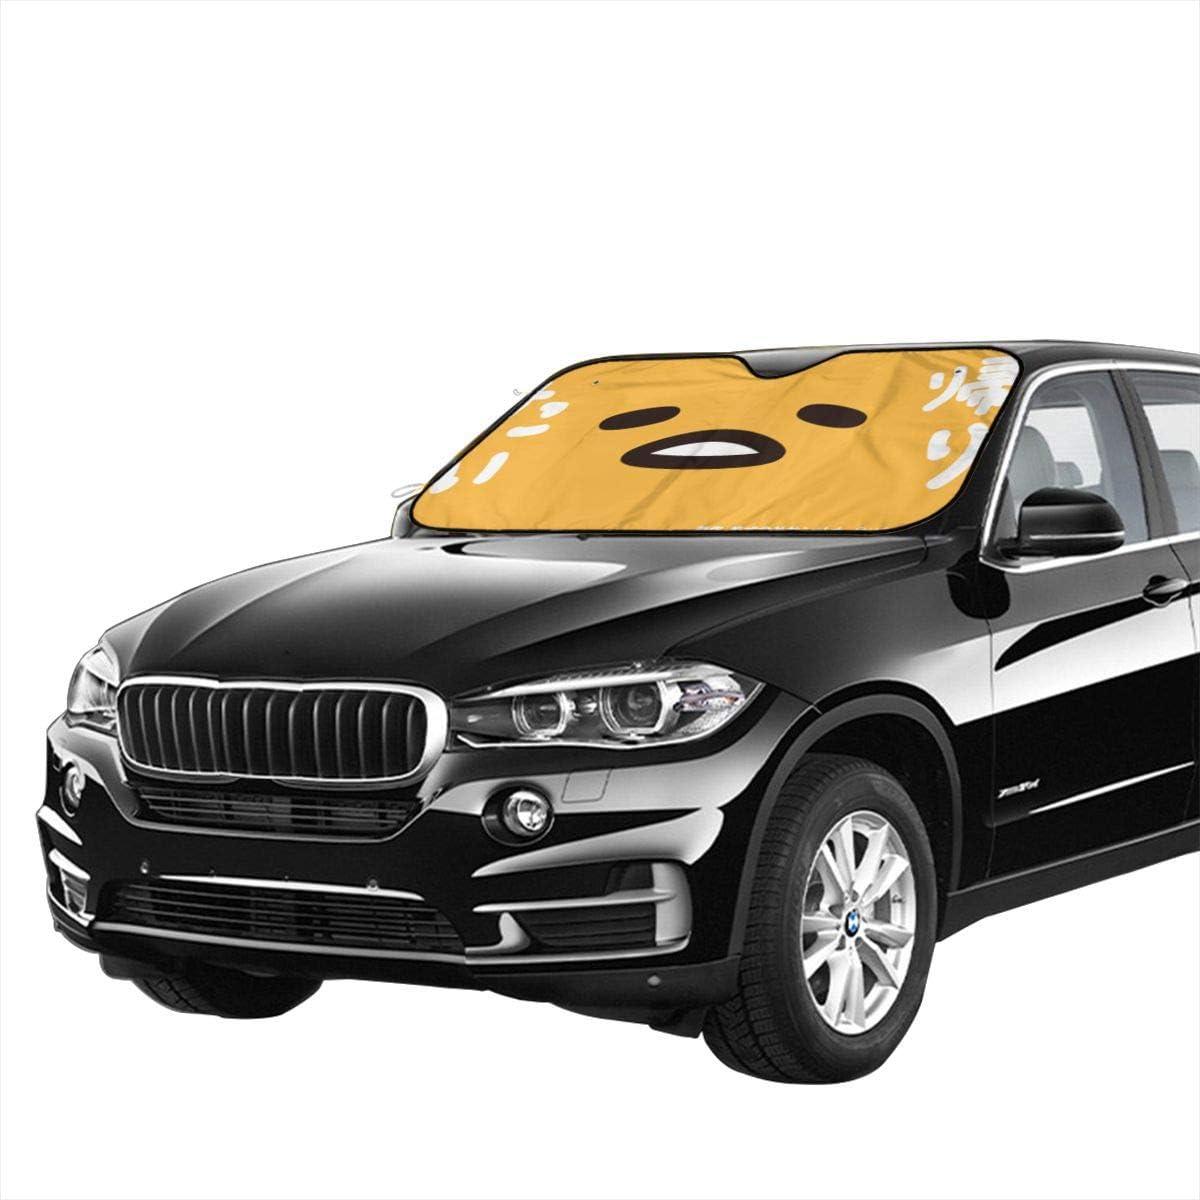 70 X 130cm Gudetama Large Foldable Car Sunshade 27.5 X 51 in Automotive Windshield Sun Blocker Visor Protector Shields Auto Keeps Vehicle Cooler for Car SUV Trucks